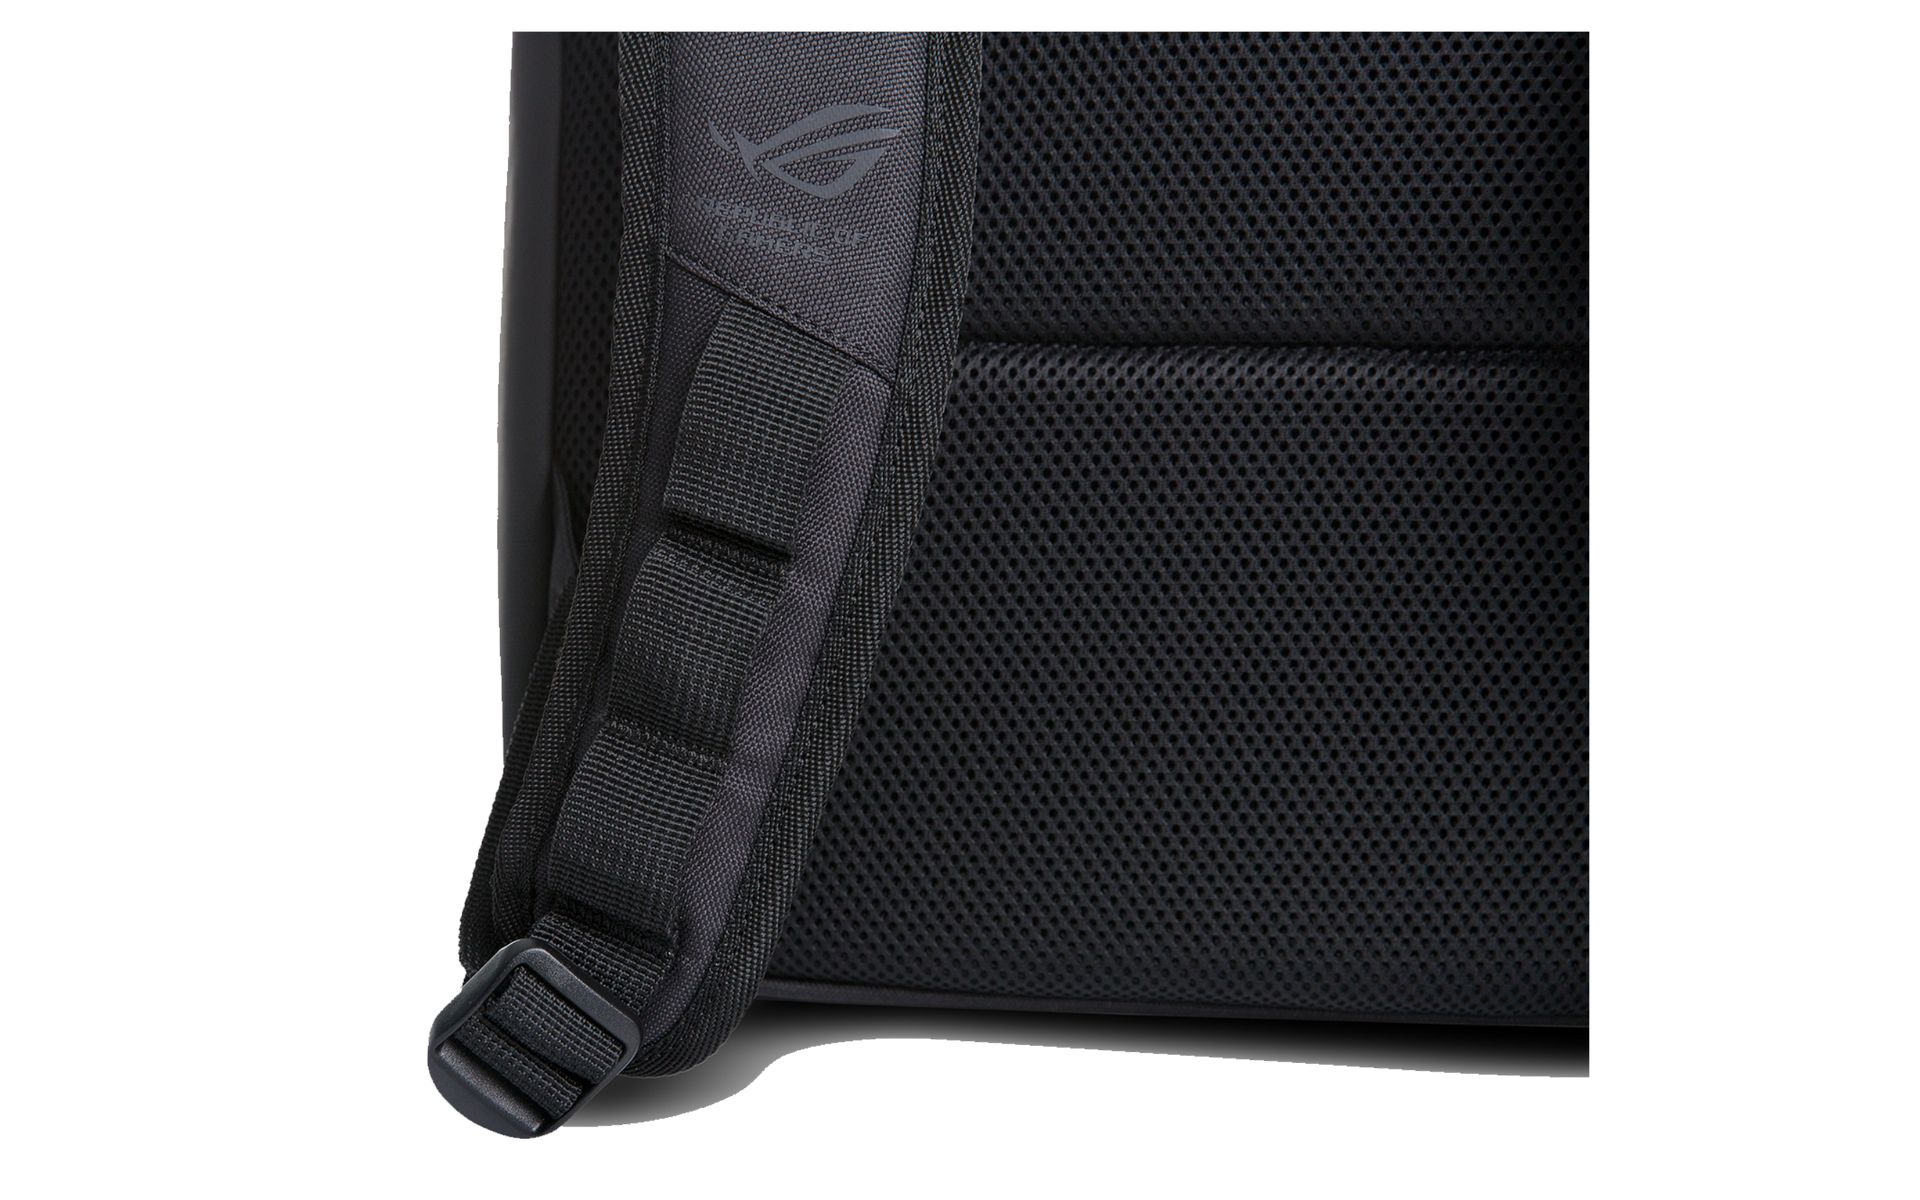 ASUS ROG Ranger BP1500G Gaming Backpack